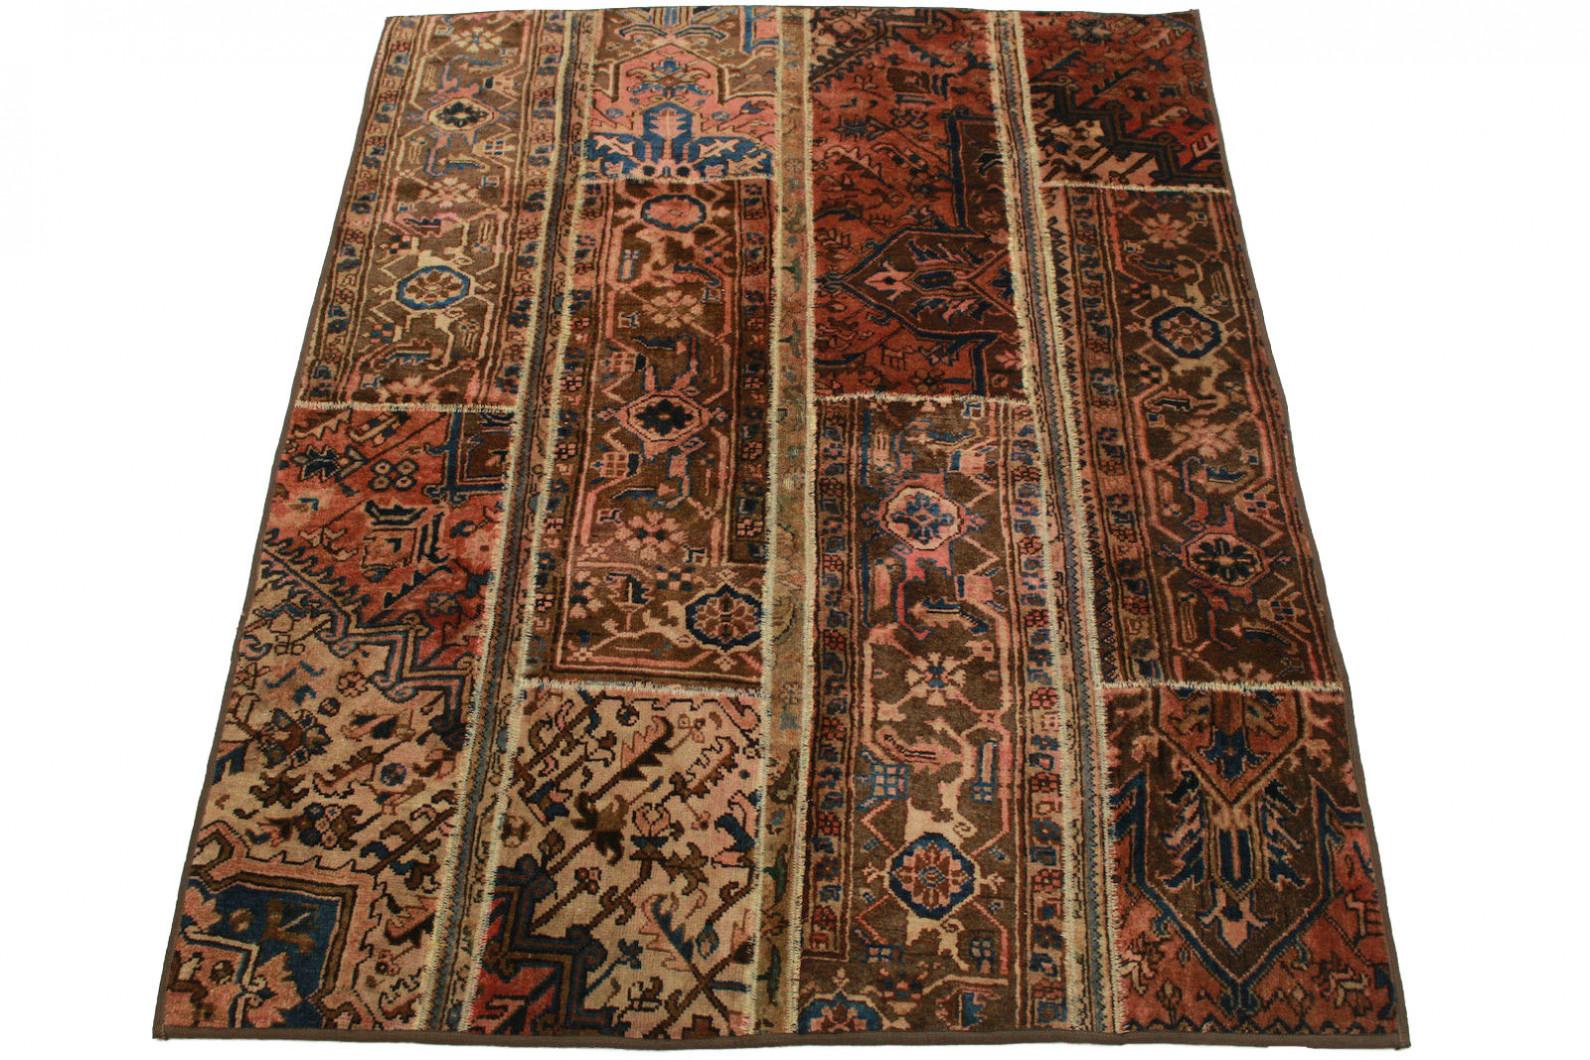 patchwork teppich braun rosa in 200x150cm 1001 1358 bei. Black Bedroom Furniture Sets. Home Design Ideas